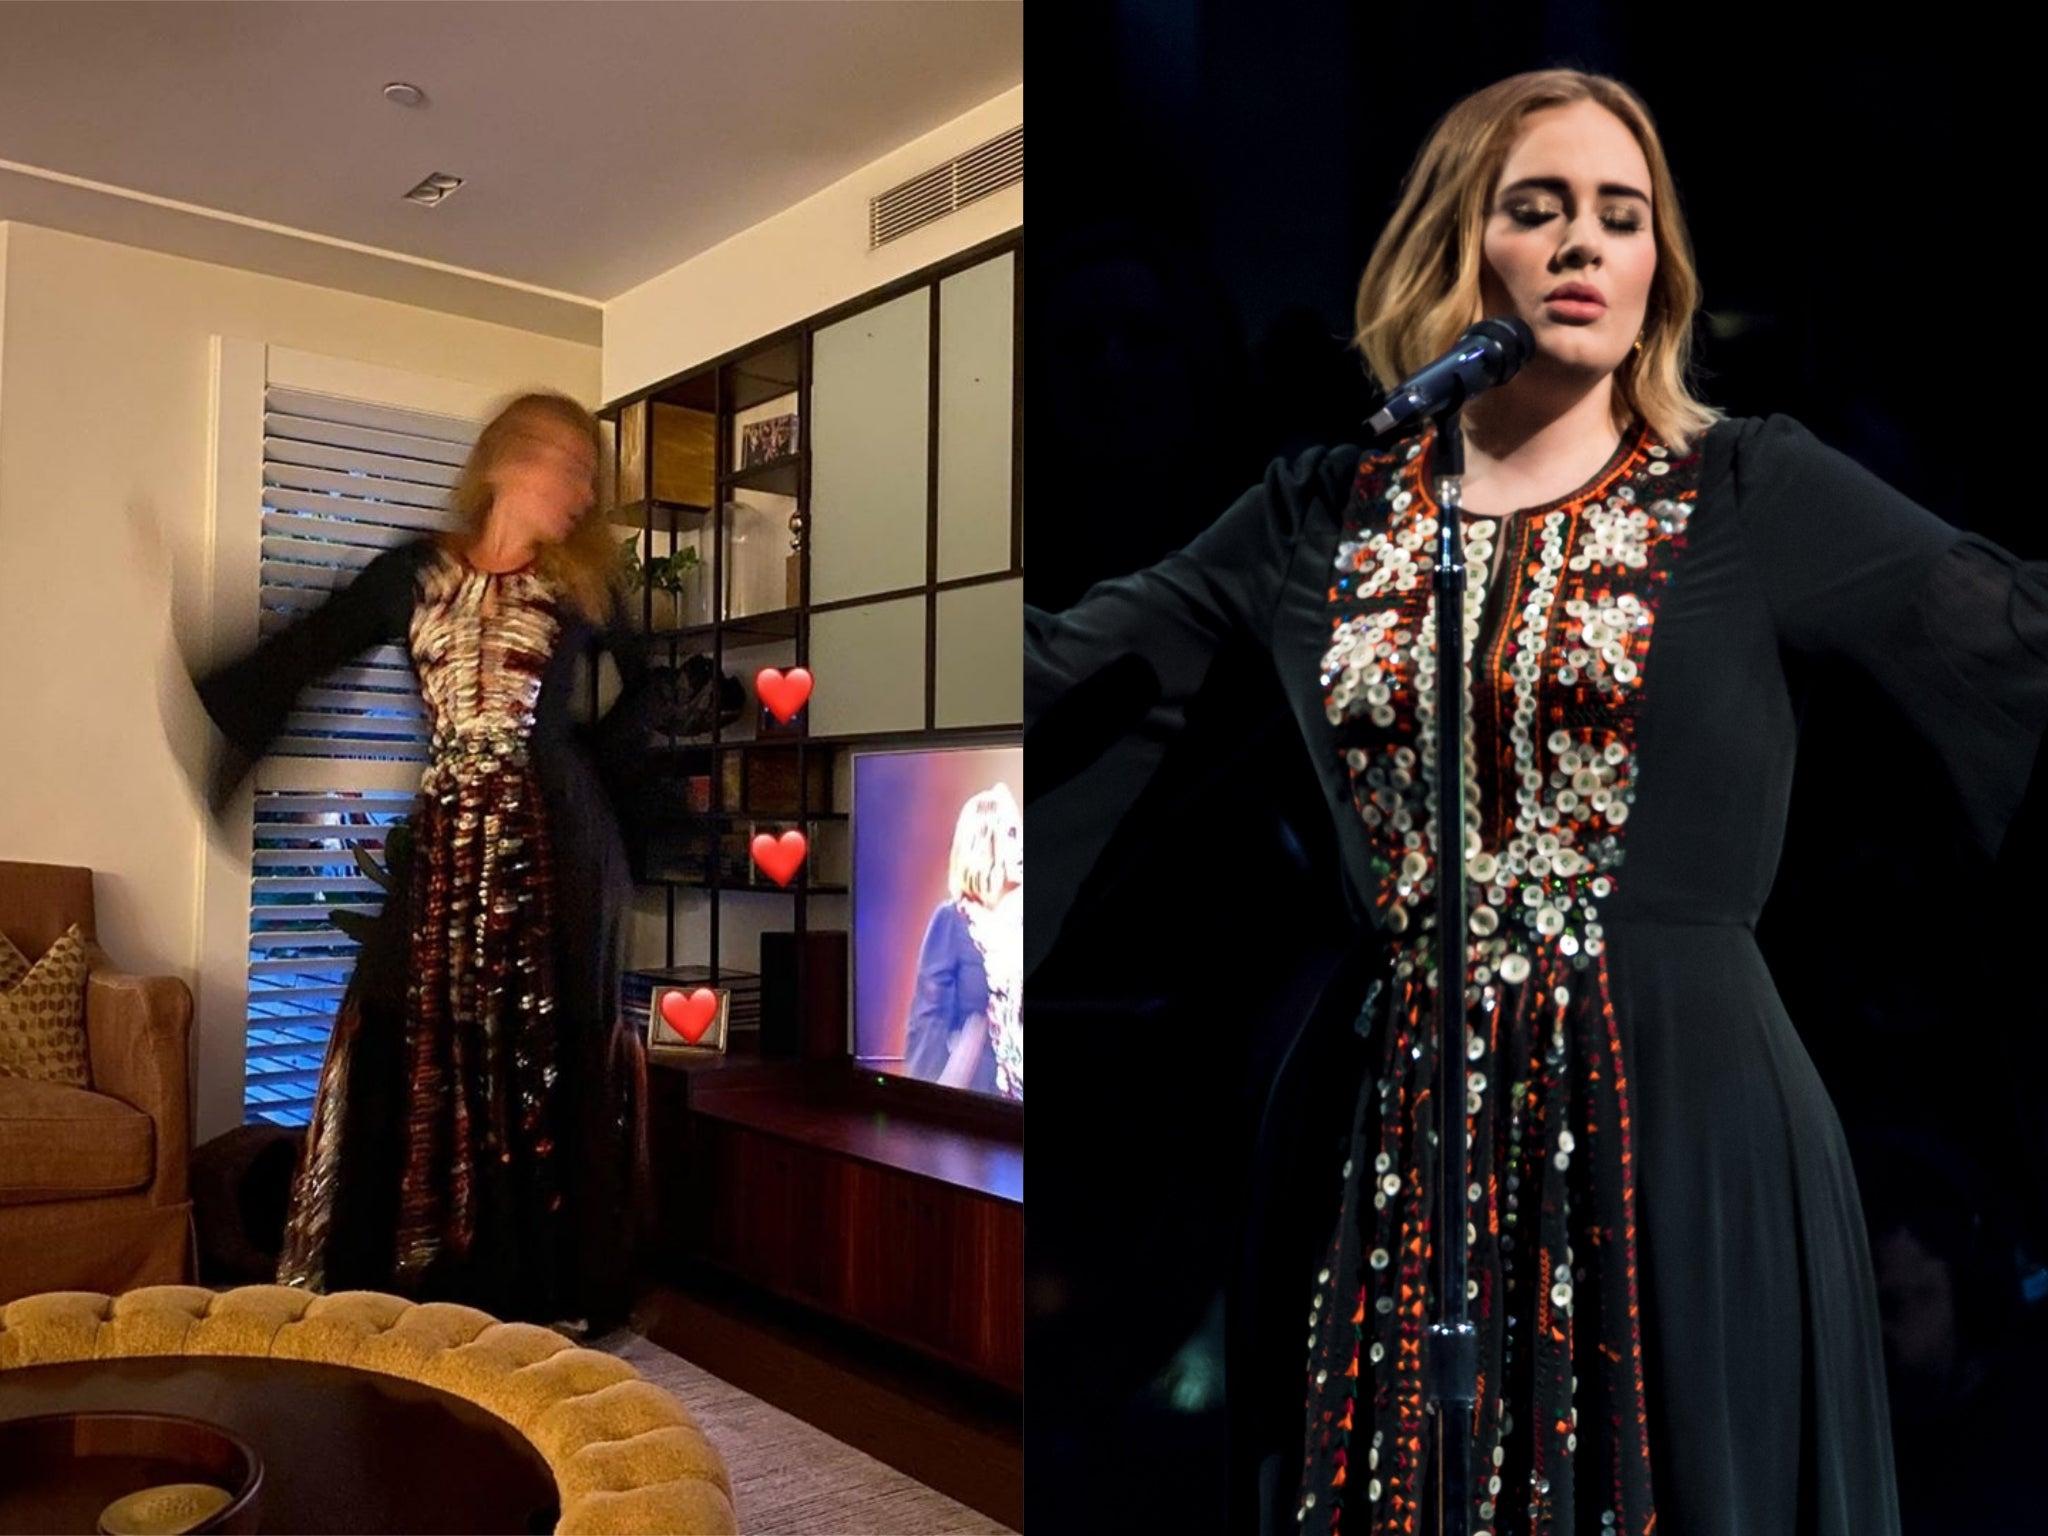 Adele rewears bespoke Glastonbury dress that took 200 hours to make